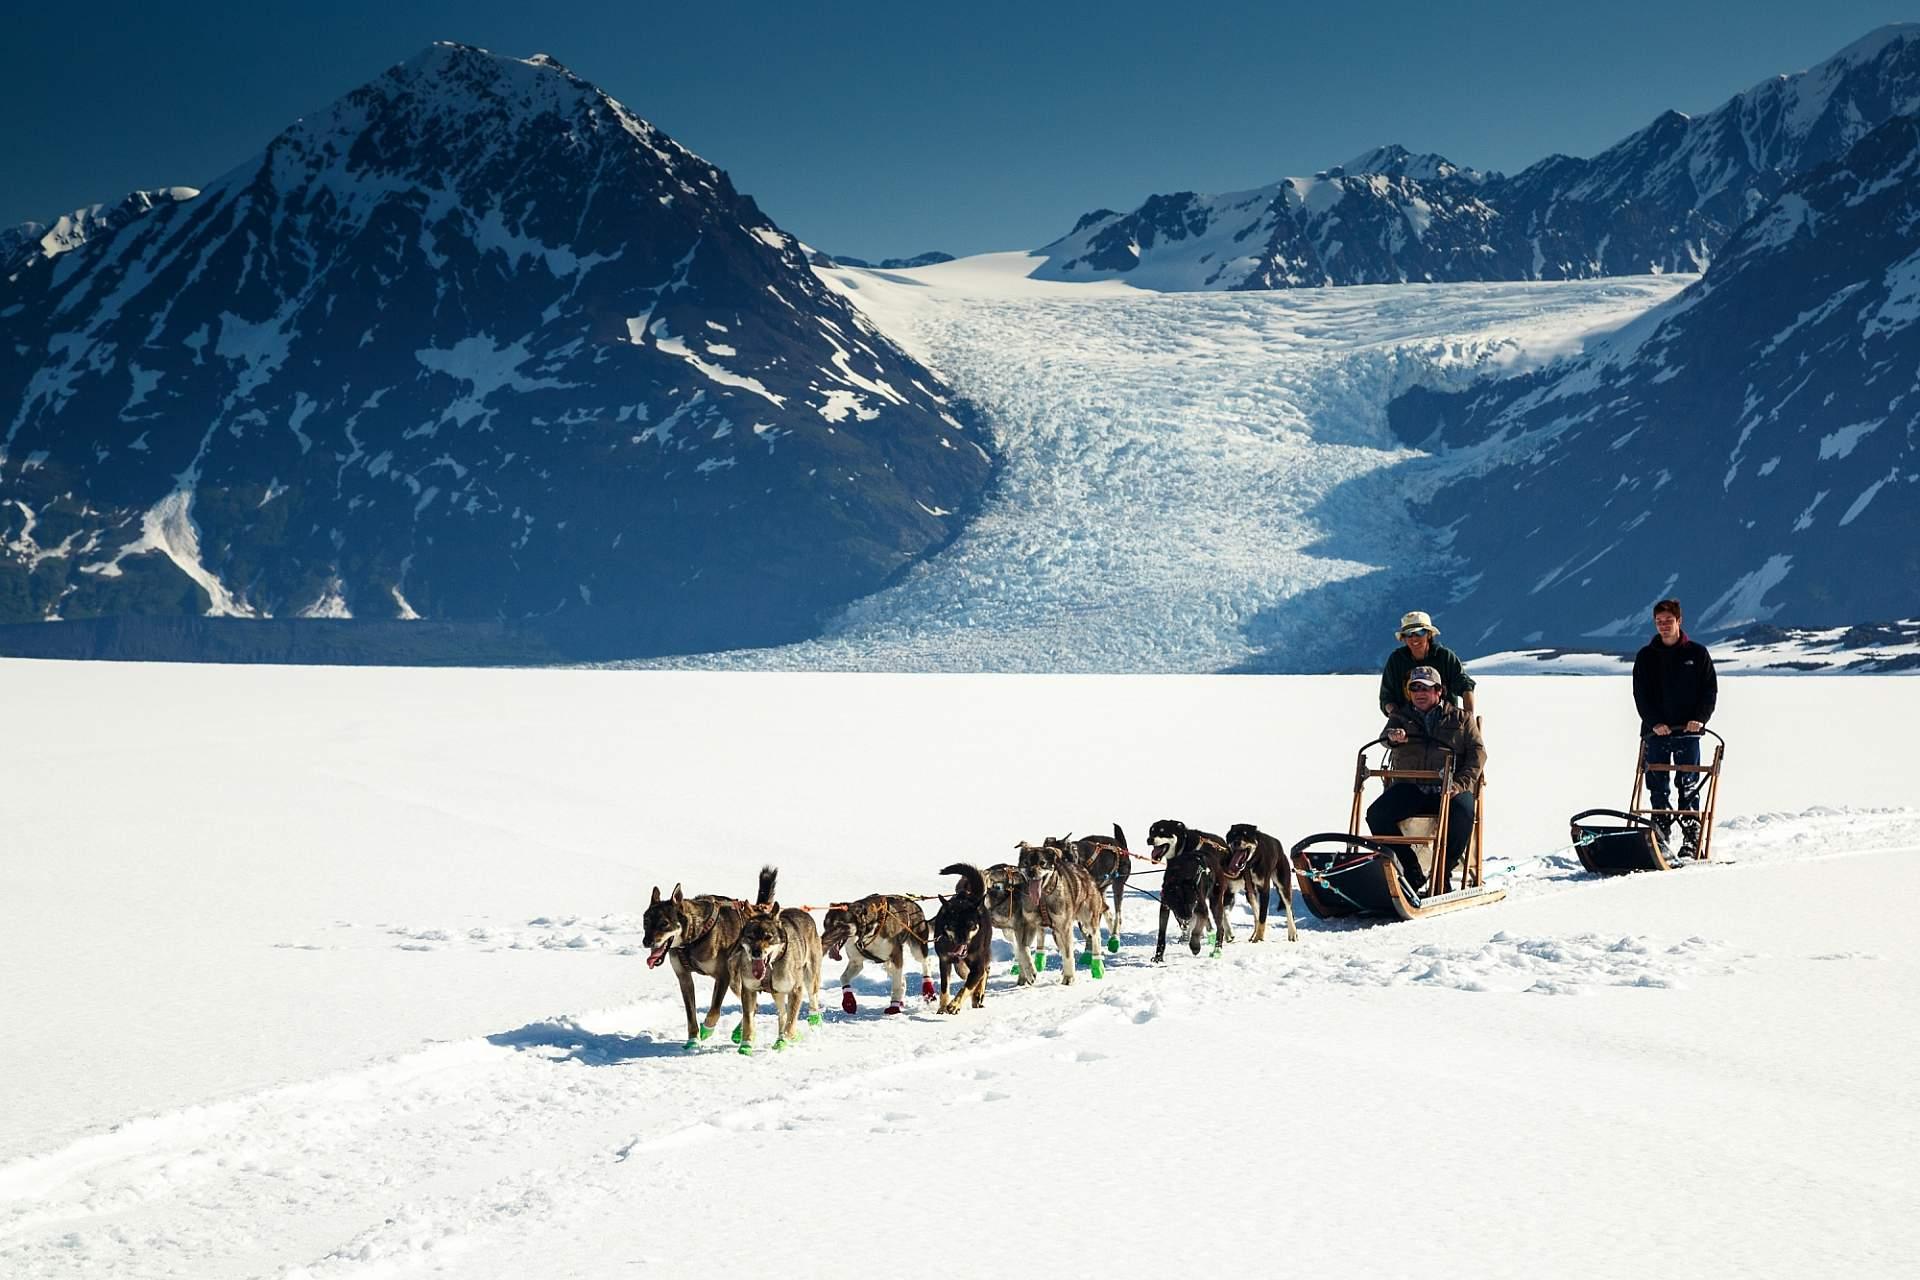 Jeff Schultz Mushing Tour Chugach Mountains 150613 4 M6744